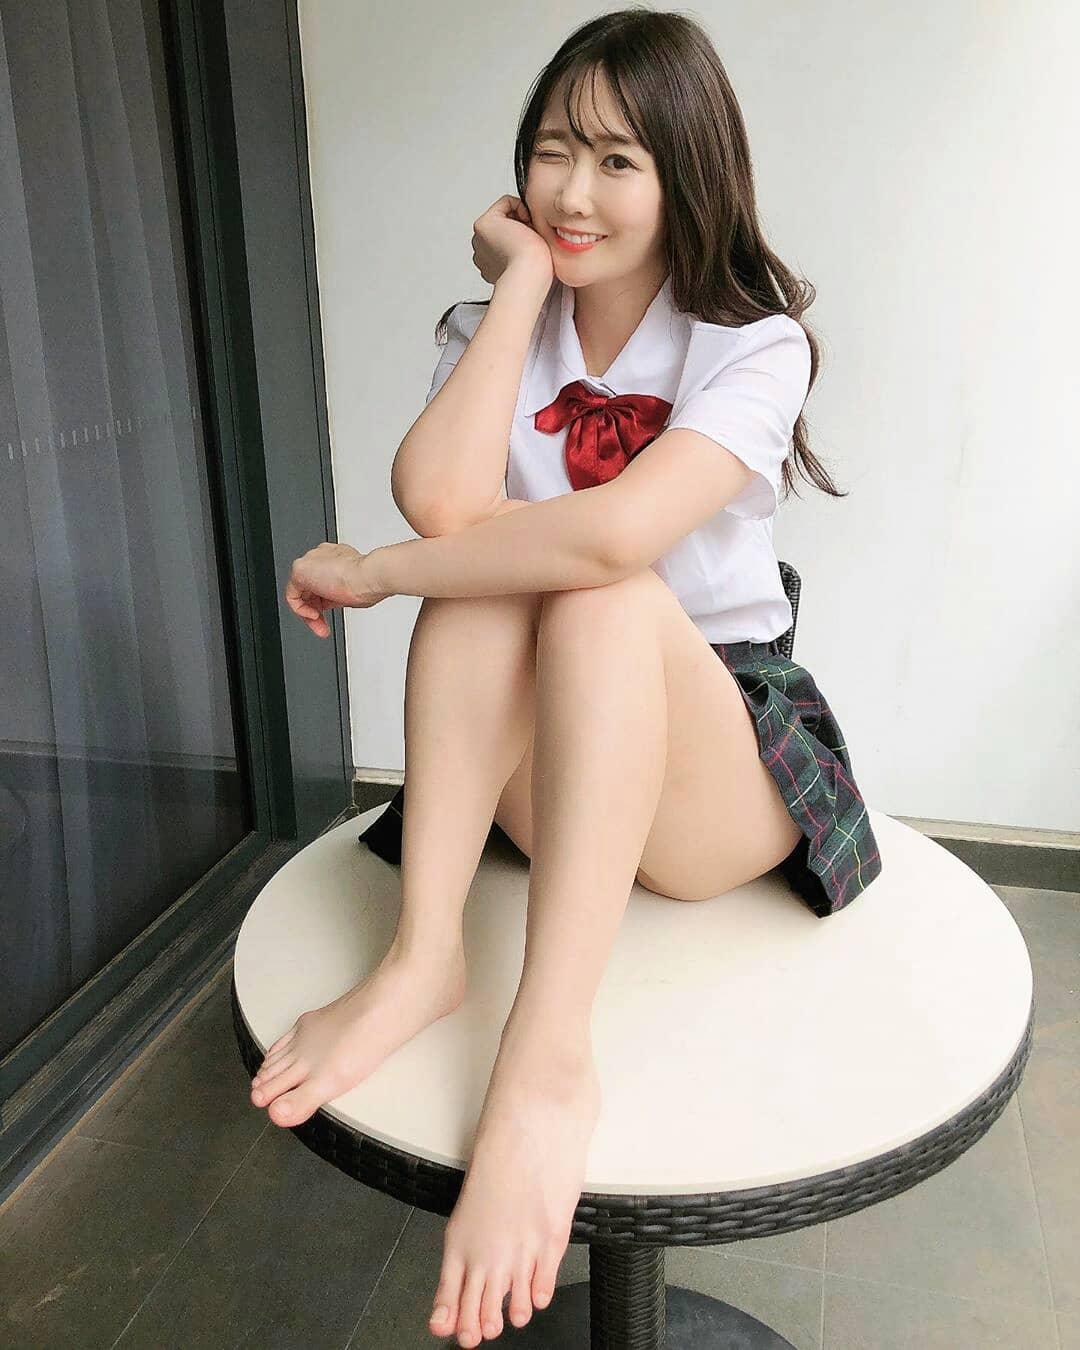 Beautiful Taiwan women however sticking them out has